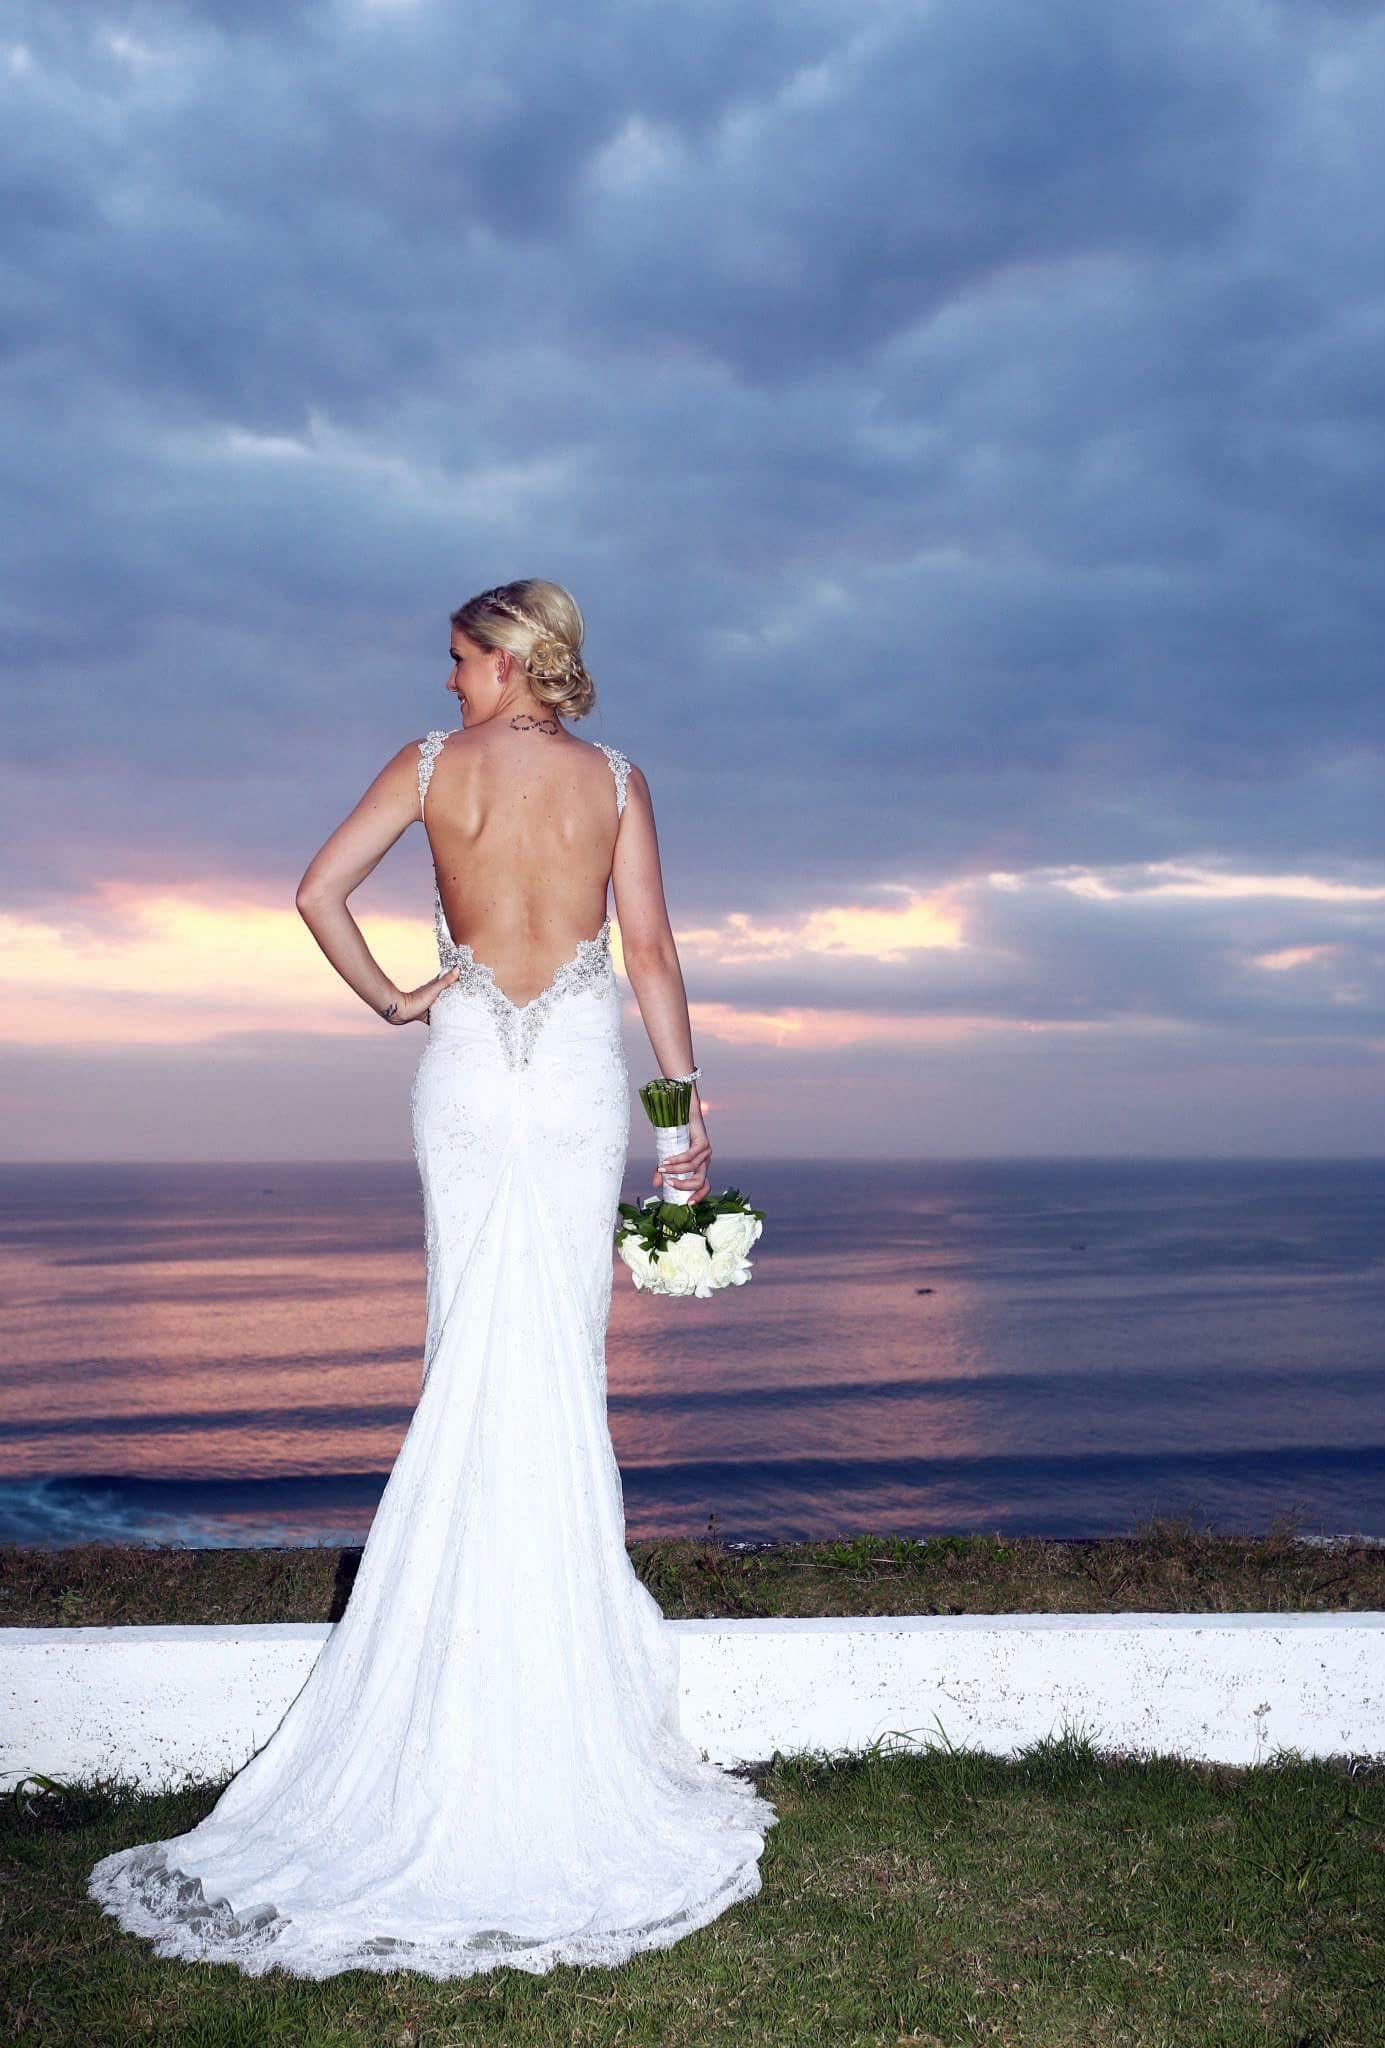 Inbal Dror Br 11 03 Used Wedding Dress On Sale 72 Off